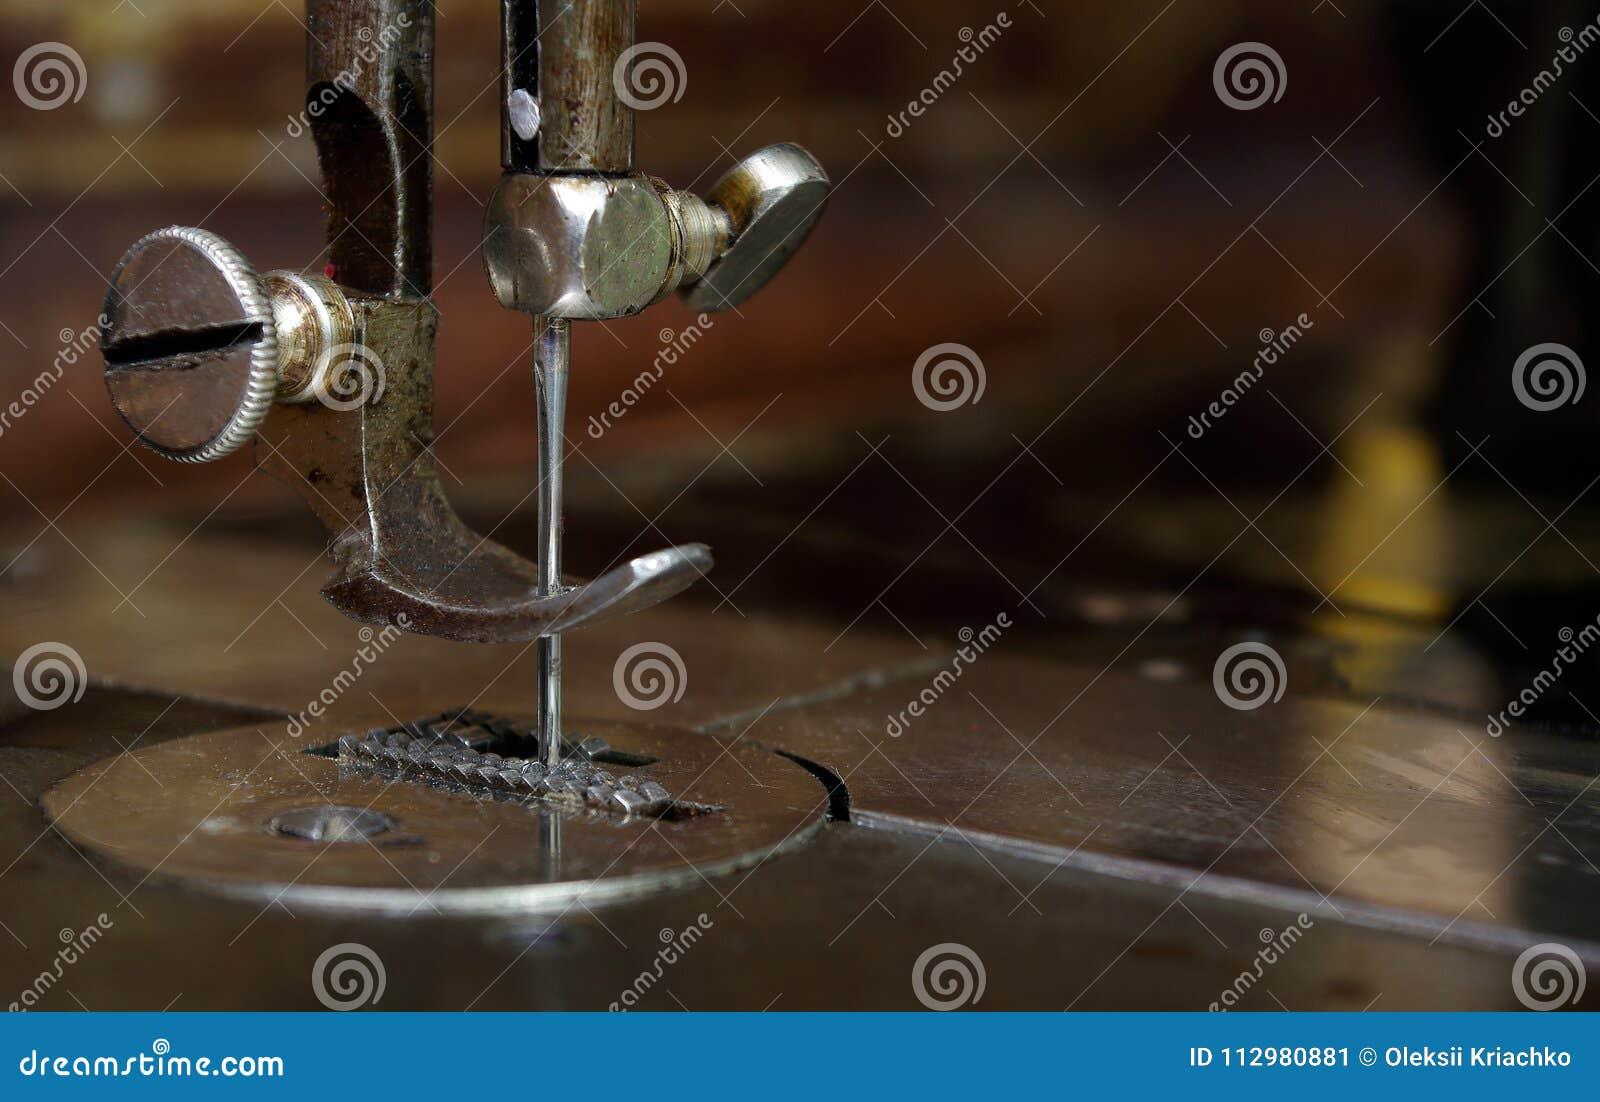 Needle sewing machine close-up.